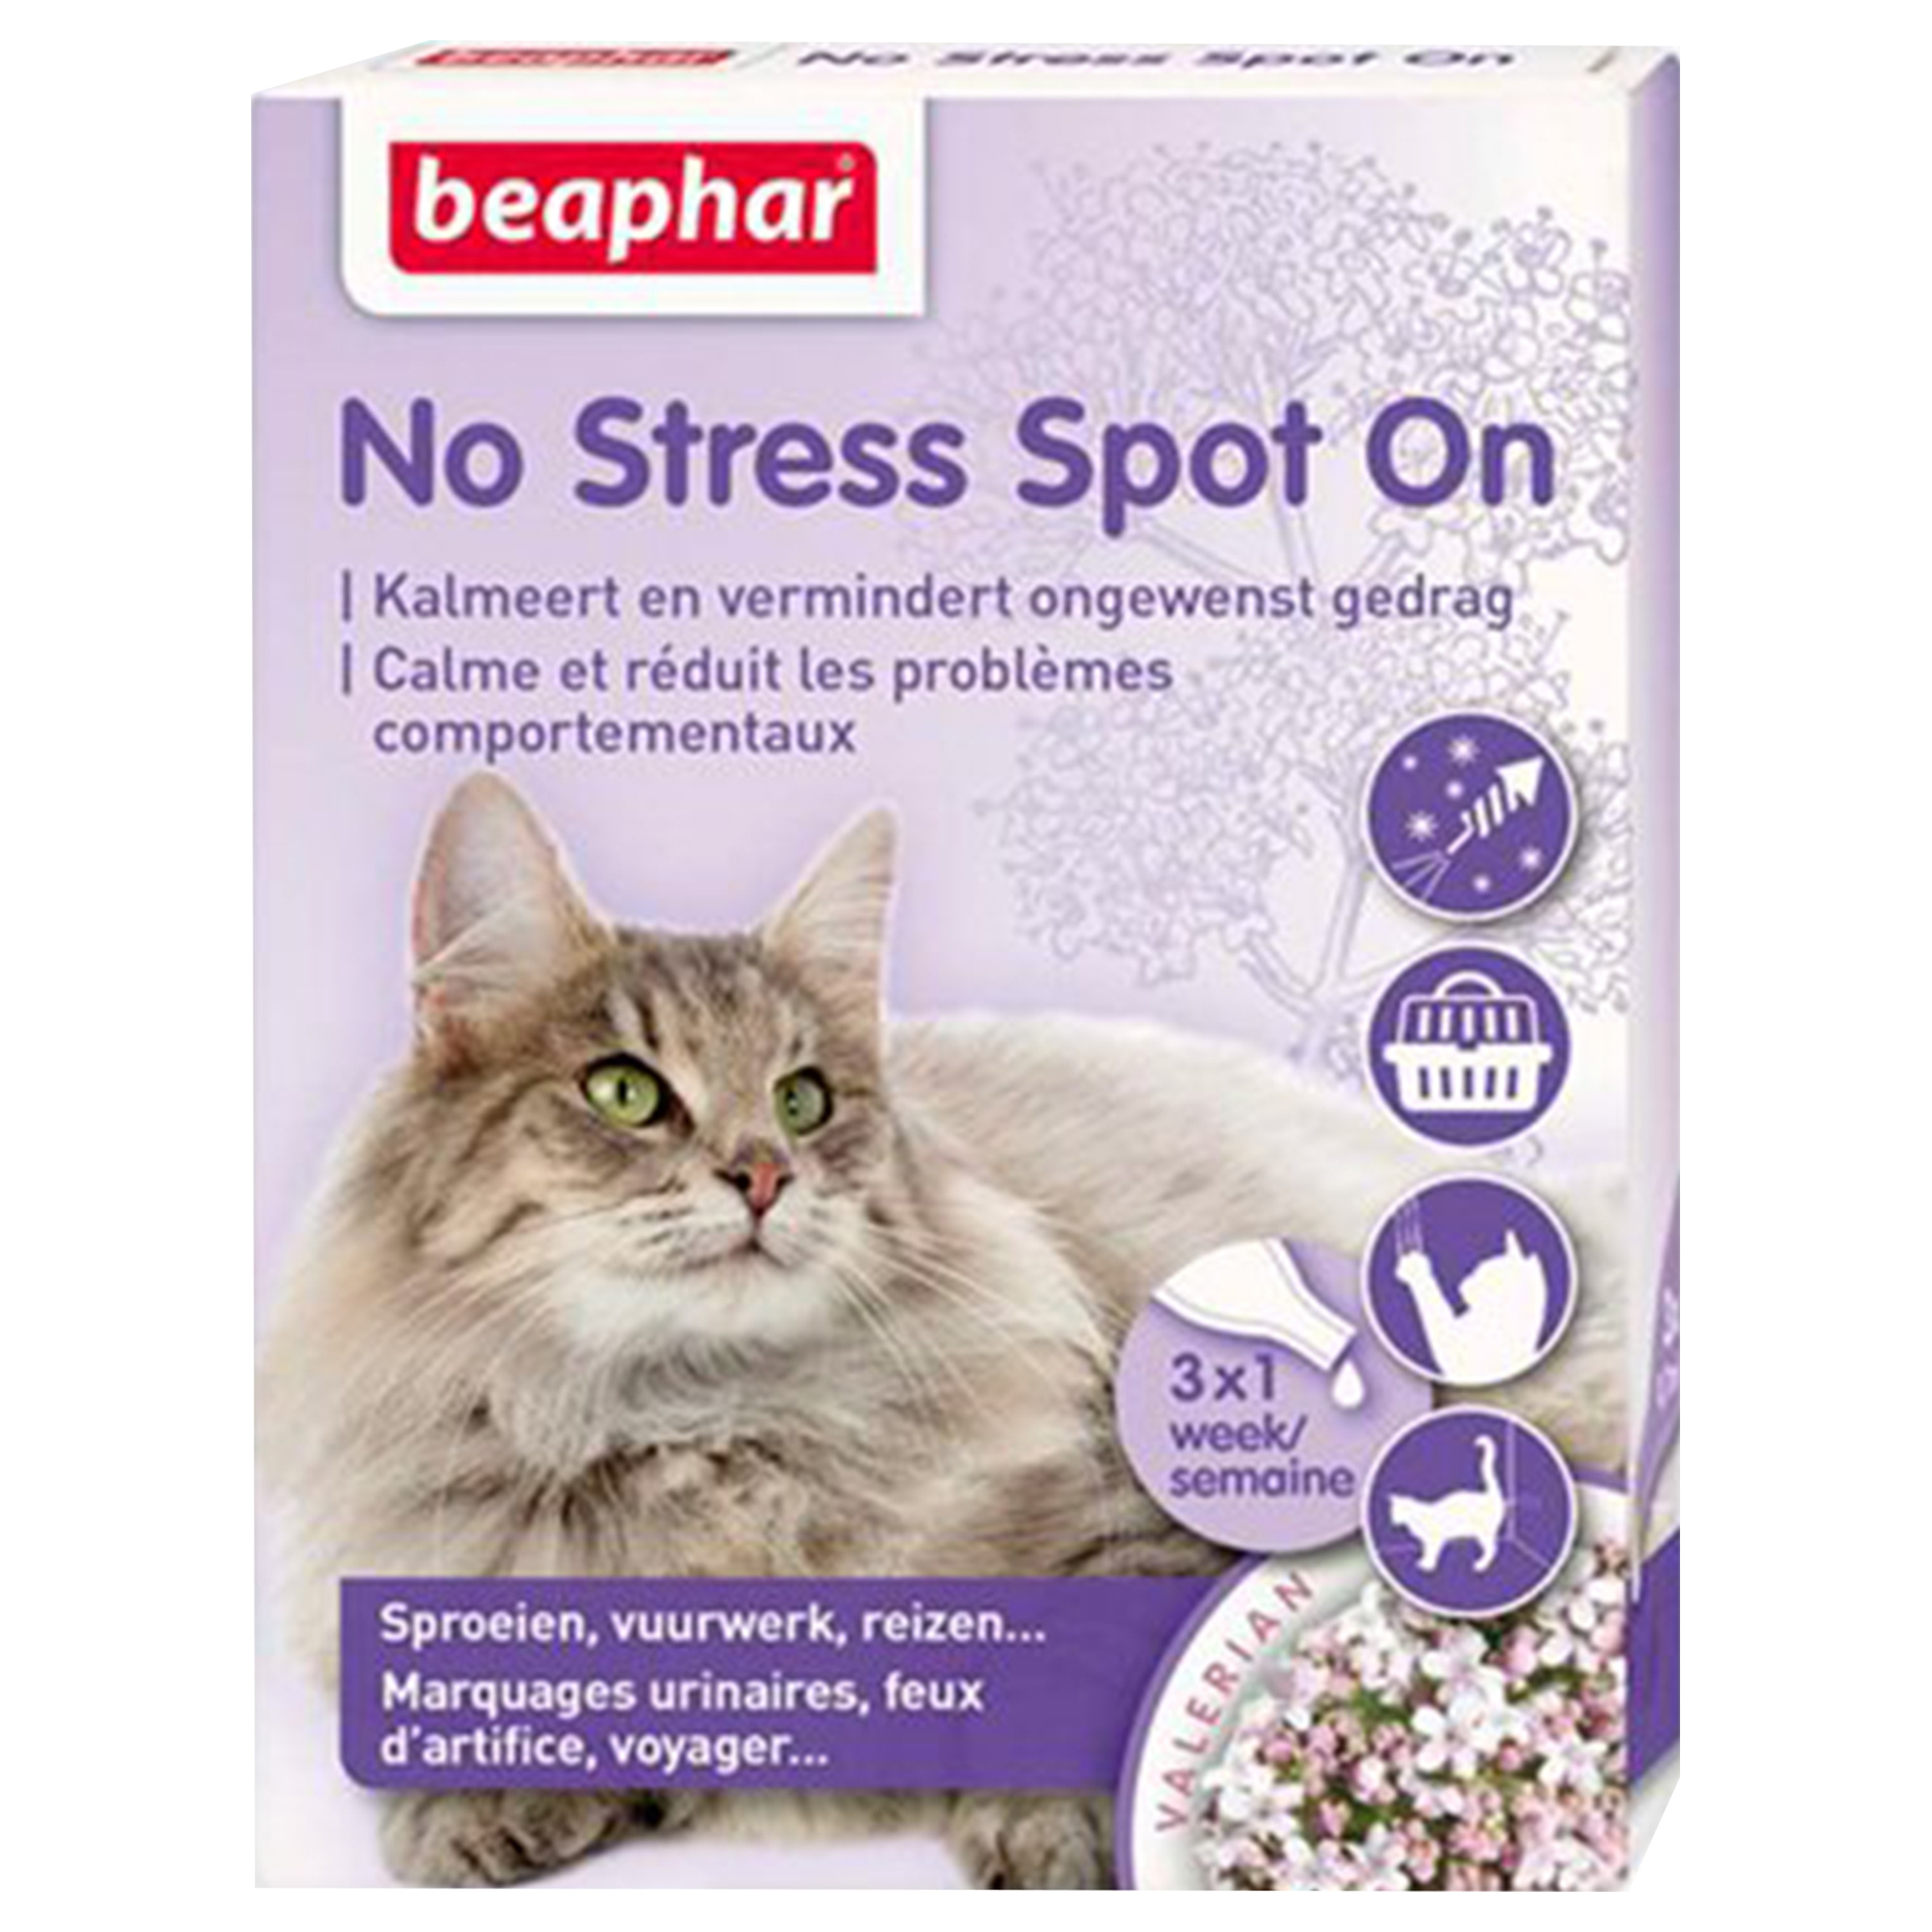 Image of beaphar No Stress Wohlfühl Spot On Katze F/NL